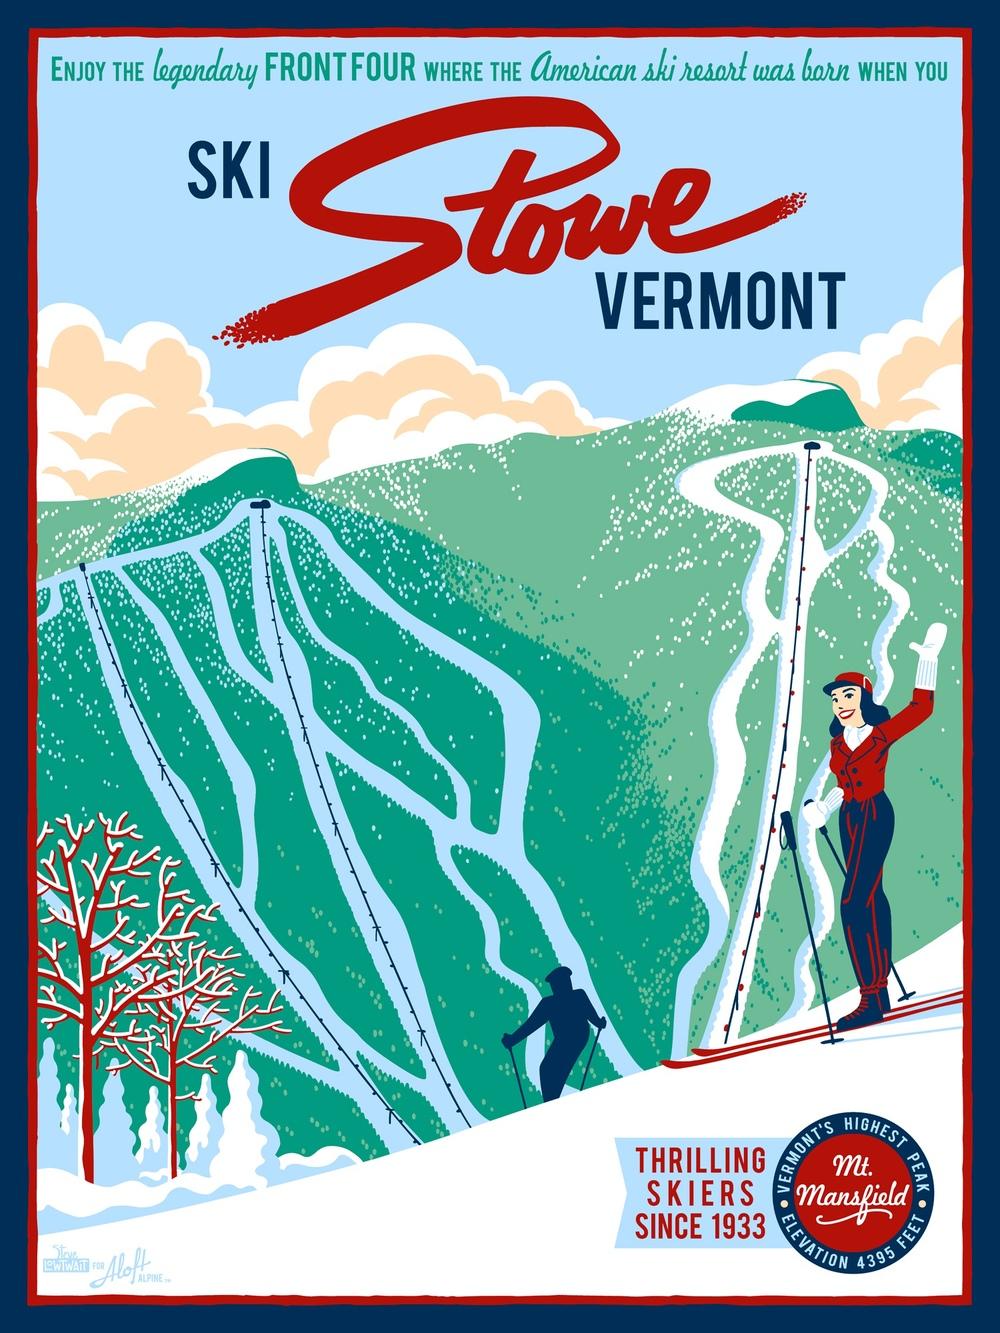 Ski Stowe, Vermont